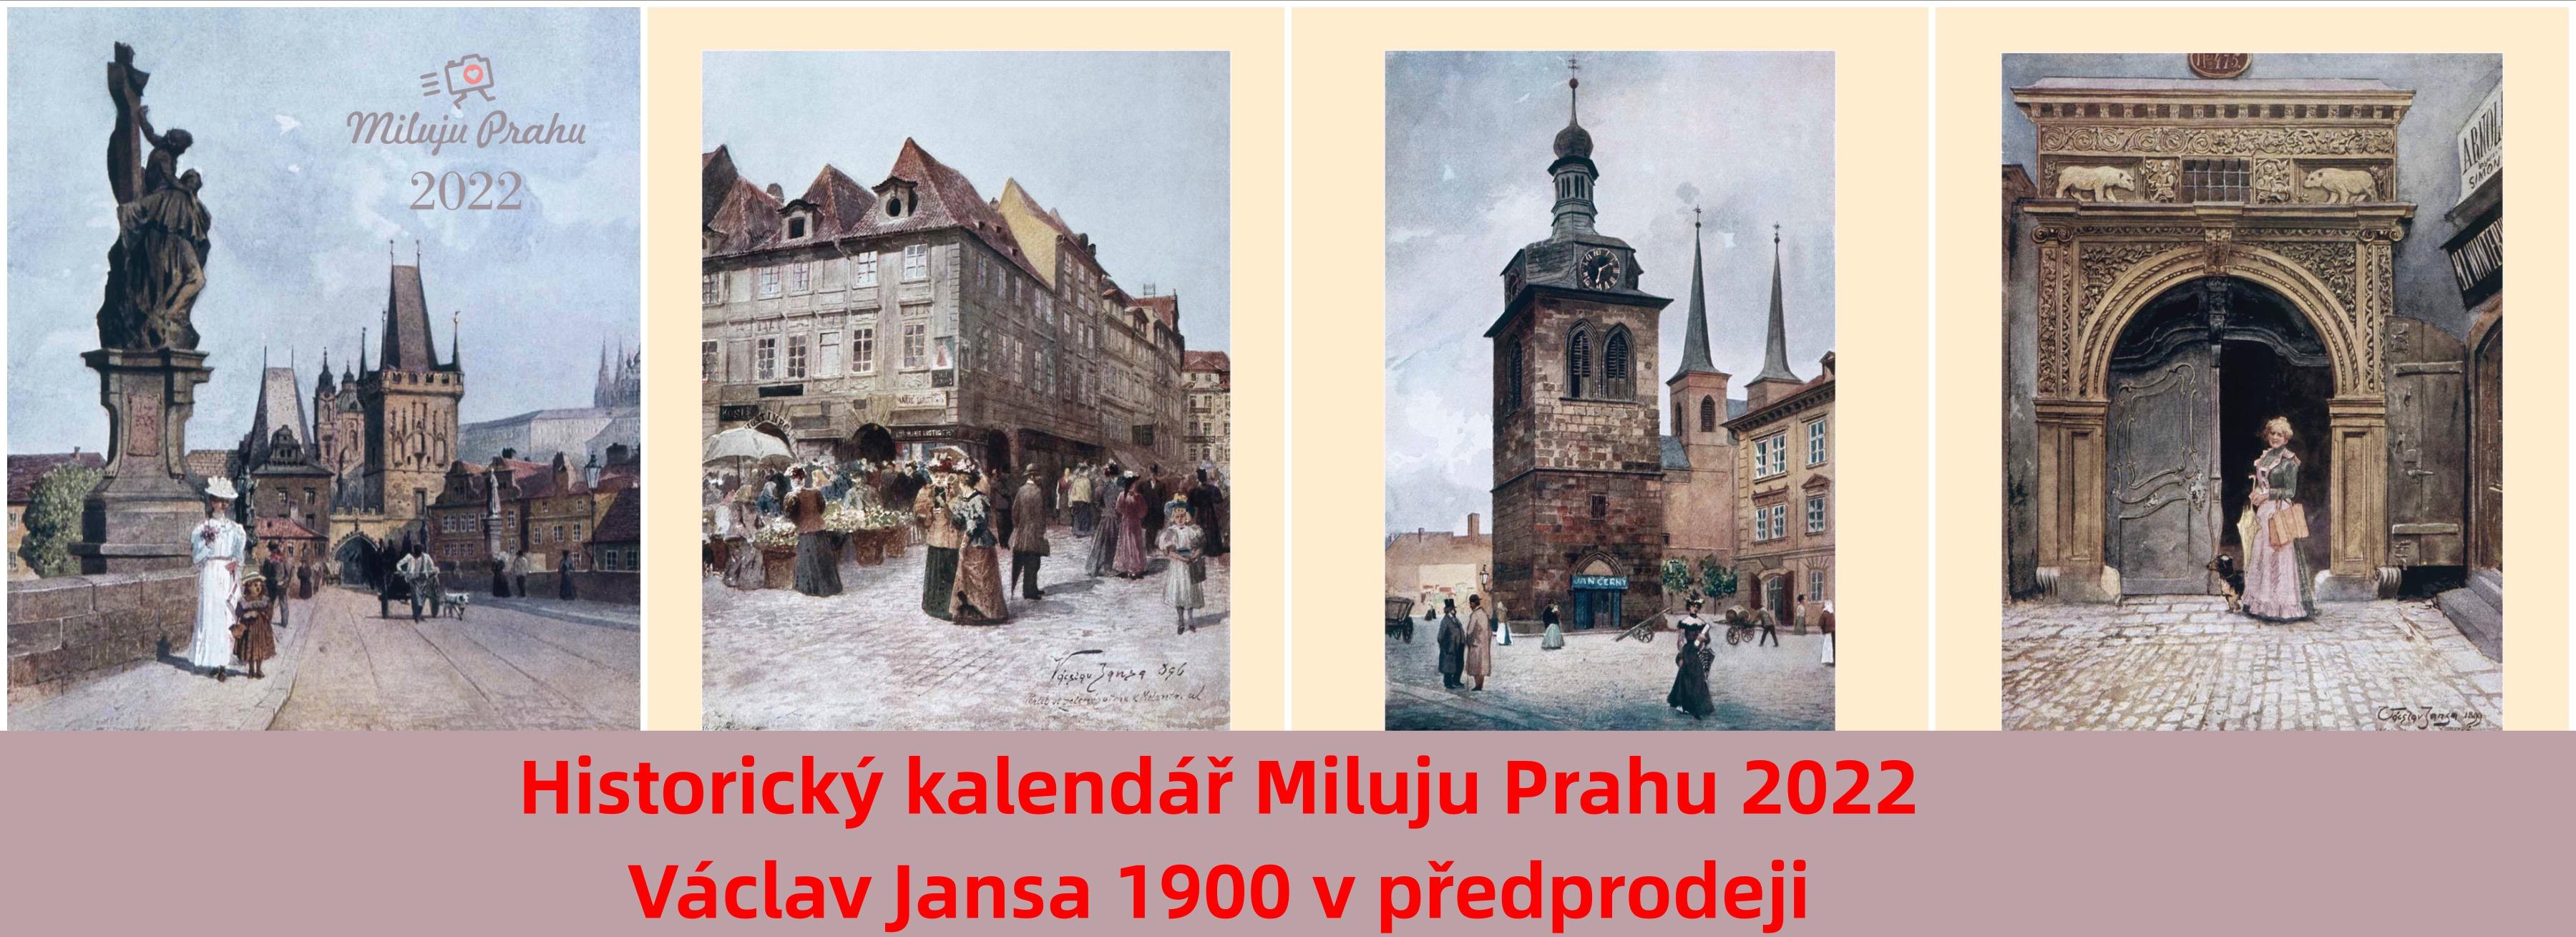 Historický kalendář Miluju Prahu 2022 Václav Jansa 1900